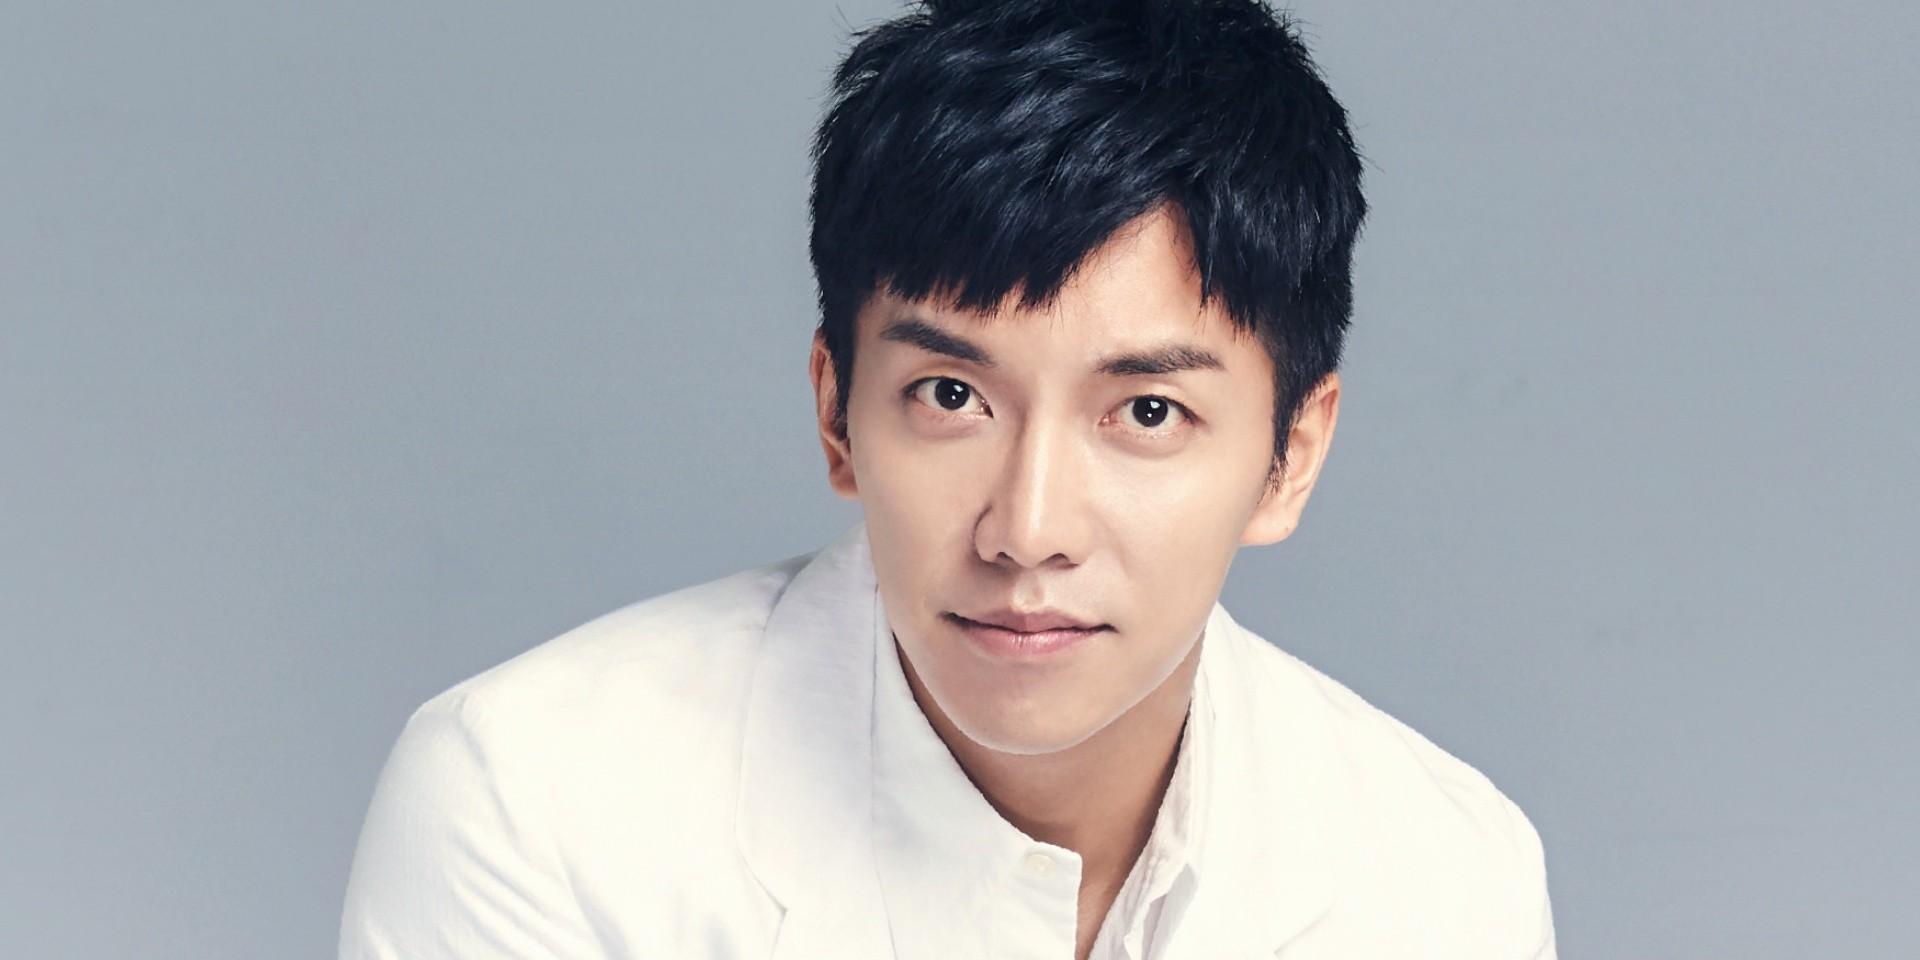 Lee Seung Gi returns to Singapore with Asia fan-meeting tour Vagabond Voyage